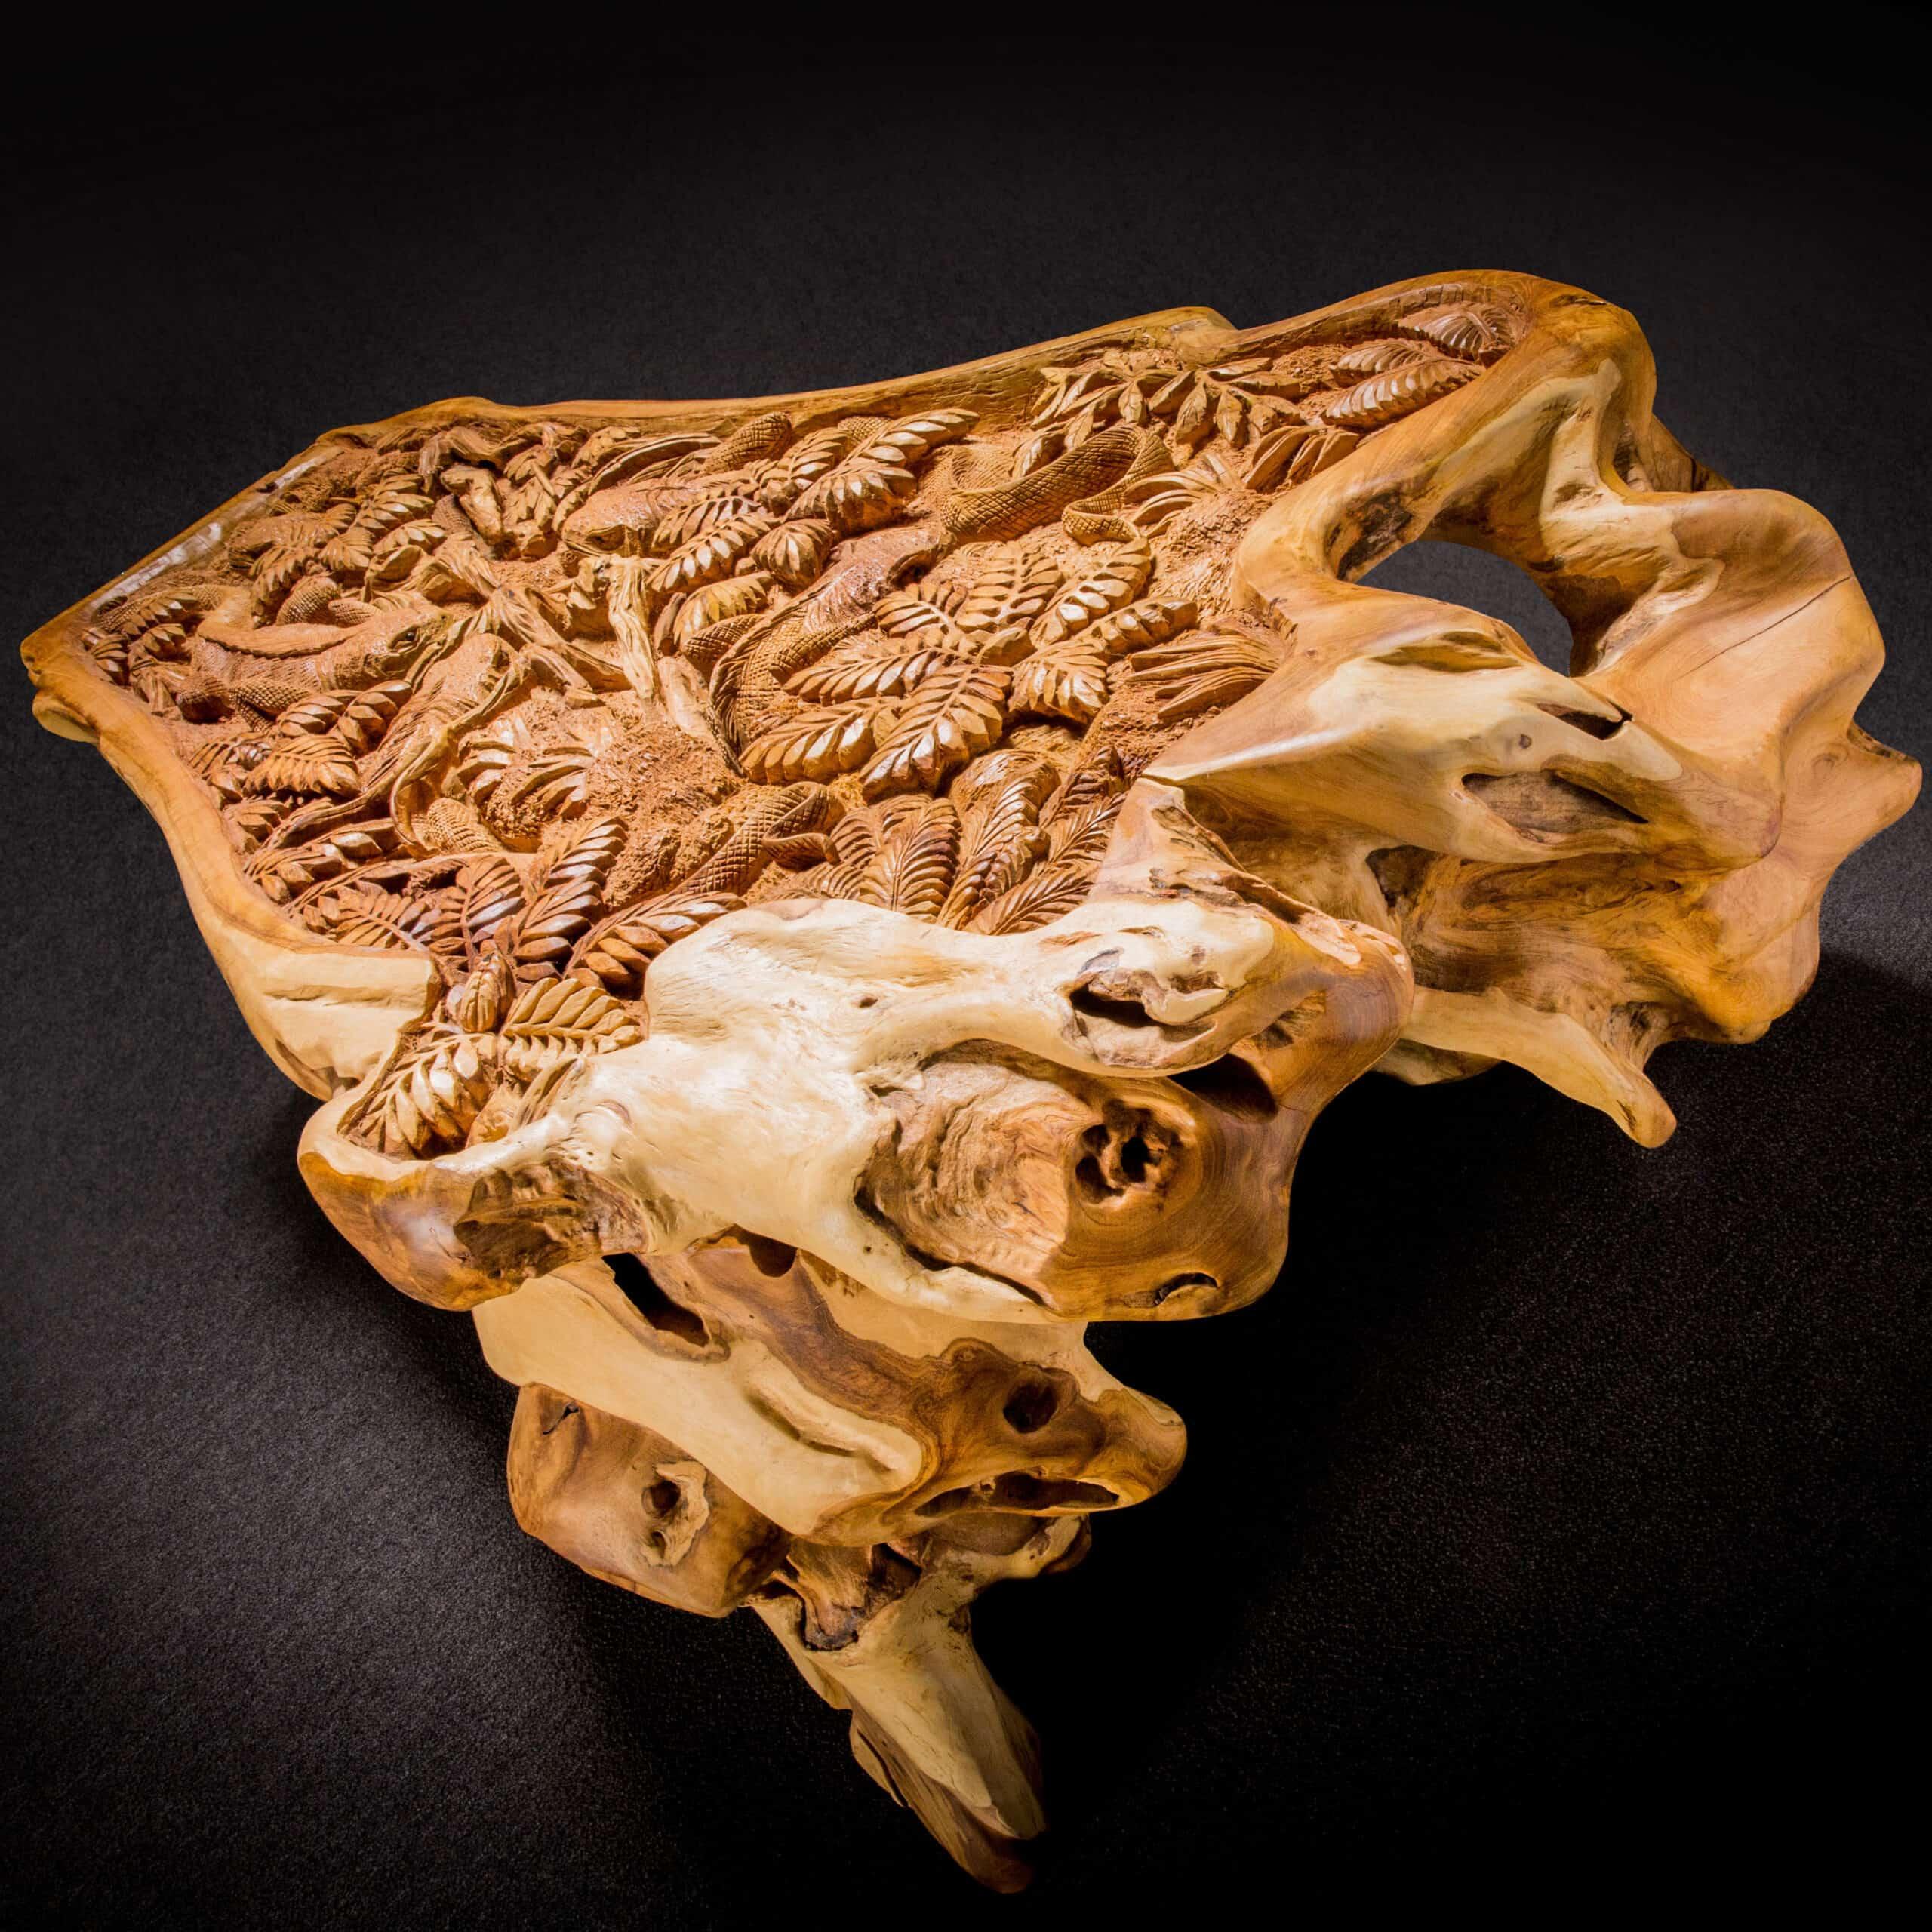 Iguana Frenzy Live Edge Teak Root Coffee Table - Decora Loft